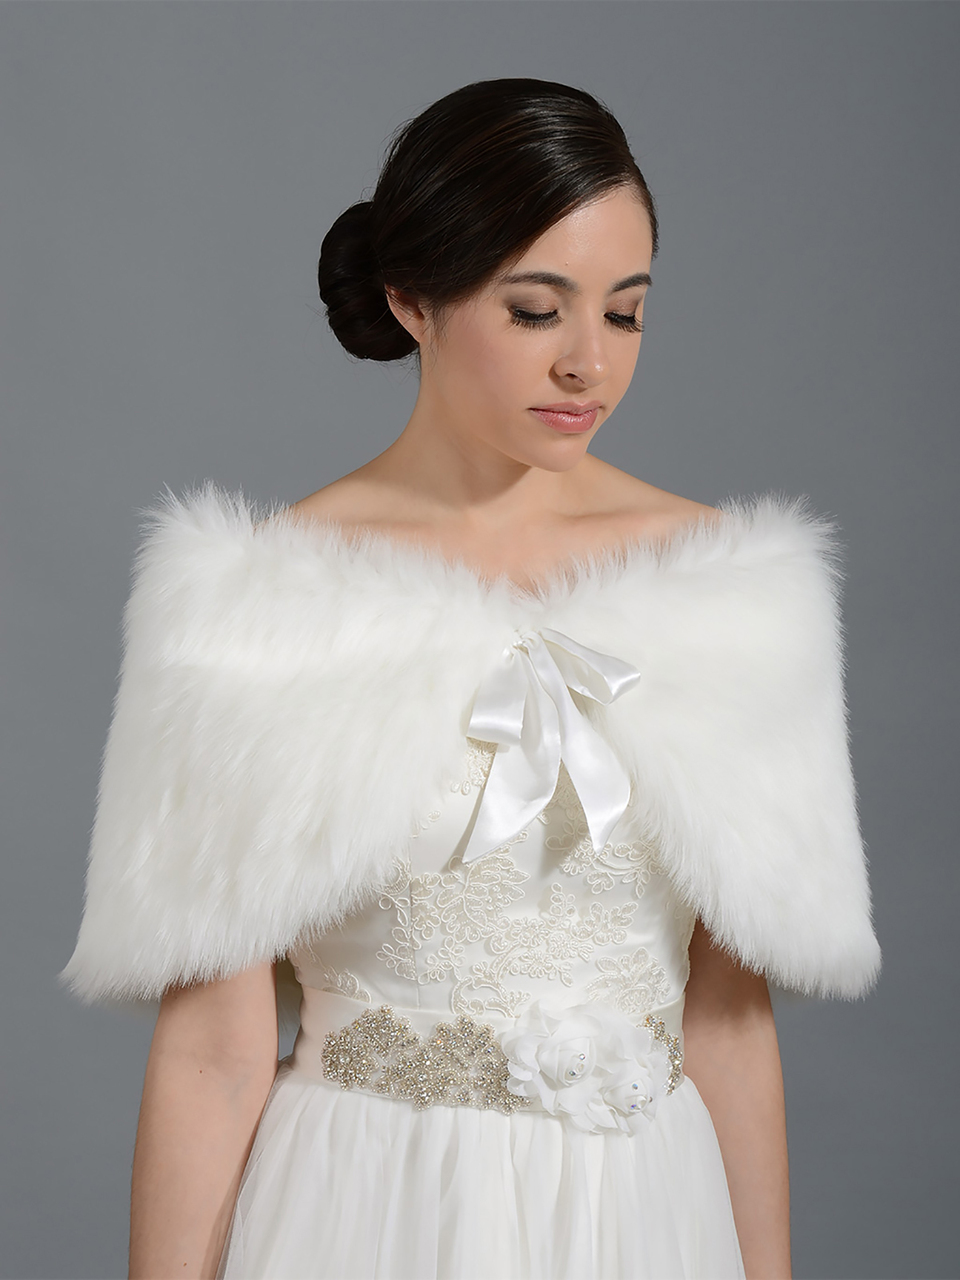 405499b85f5 Faux Fur Wrap Bridal Bridesmaids Wedding Faux Fur Wrap Bridal Bridesmaids  Wedding ...